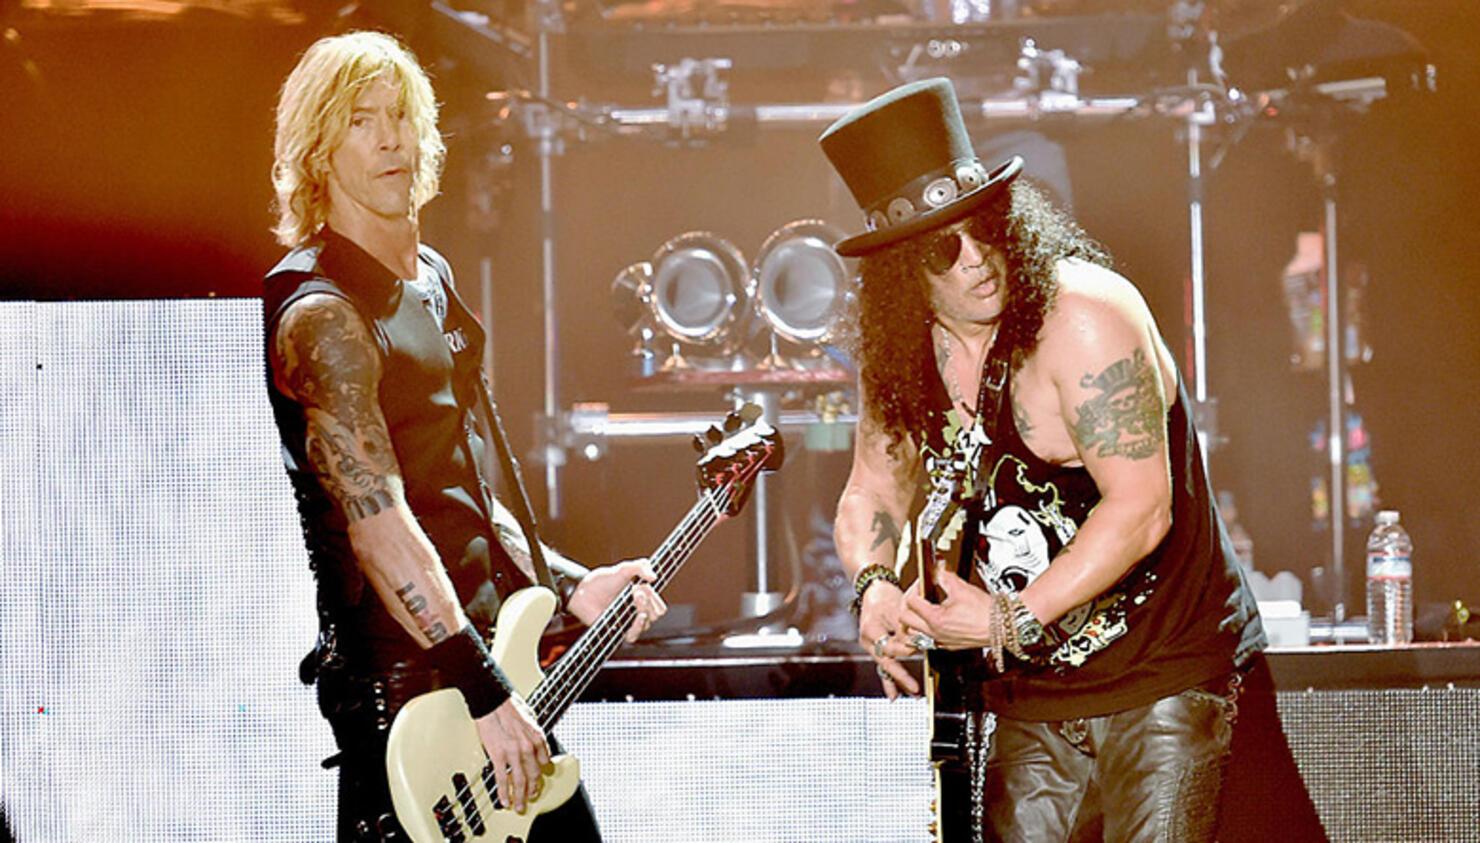 Guns N' Roses' 'Appetite for Destruction' Is Back in the Top 10